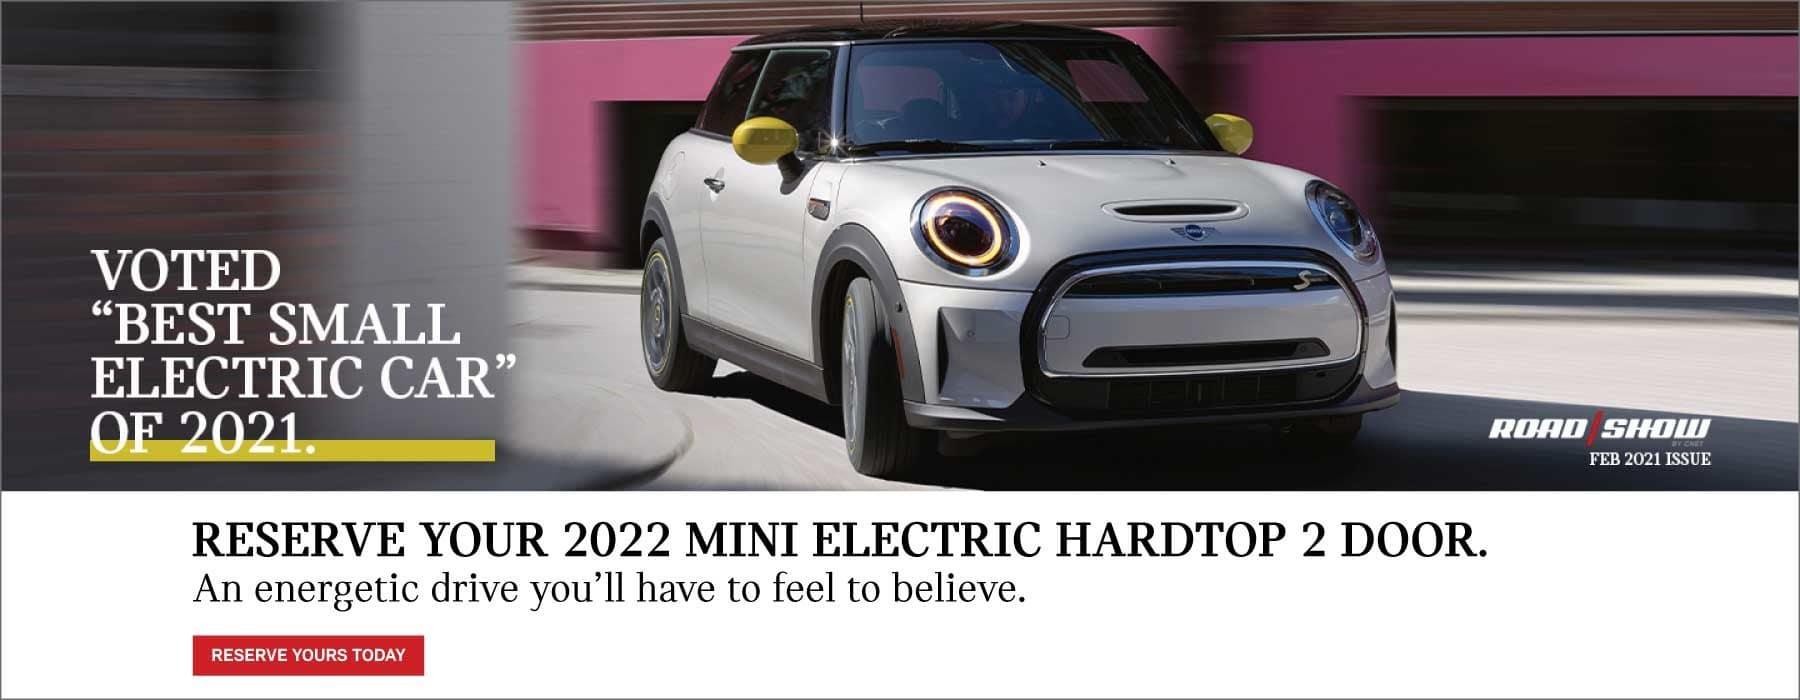 CLICK TO RESERVE YOUR 2022 MINI ELECTRIC HARDTOP 2 DOOR NOW.